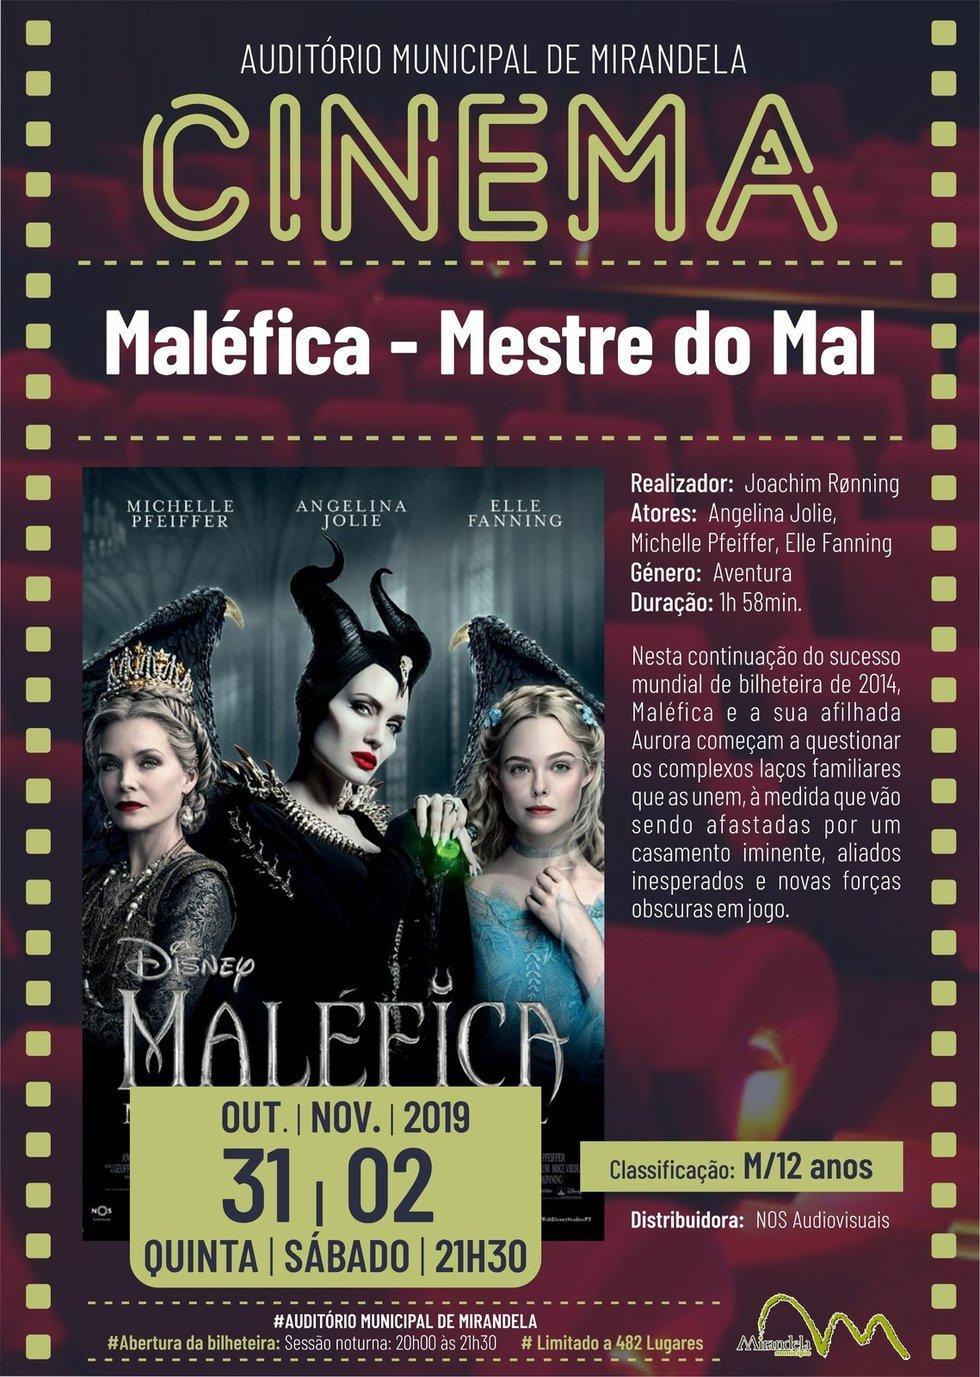 Cinema: Maléfica - Mestre do Mal